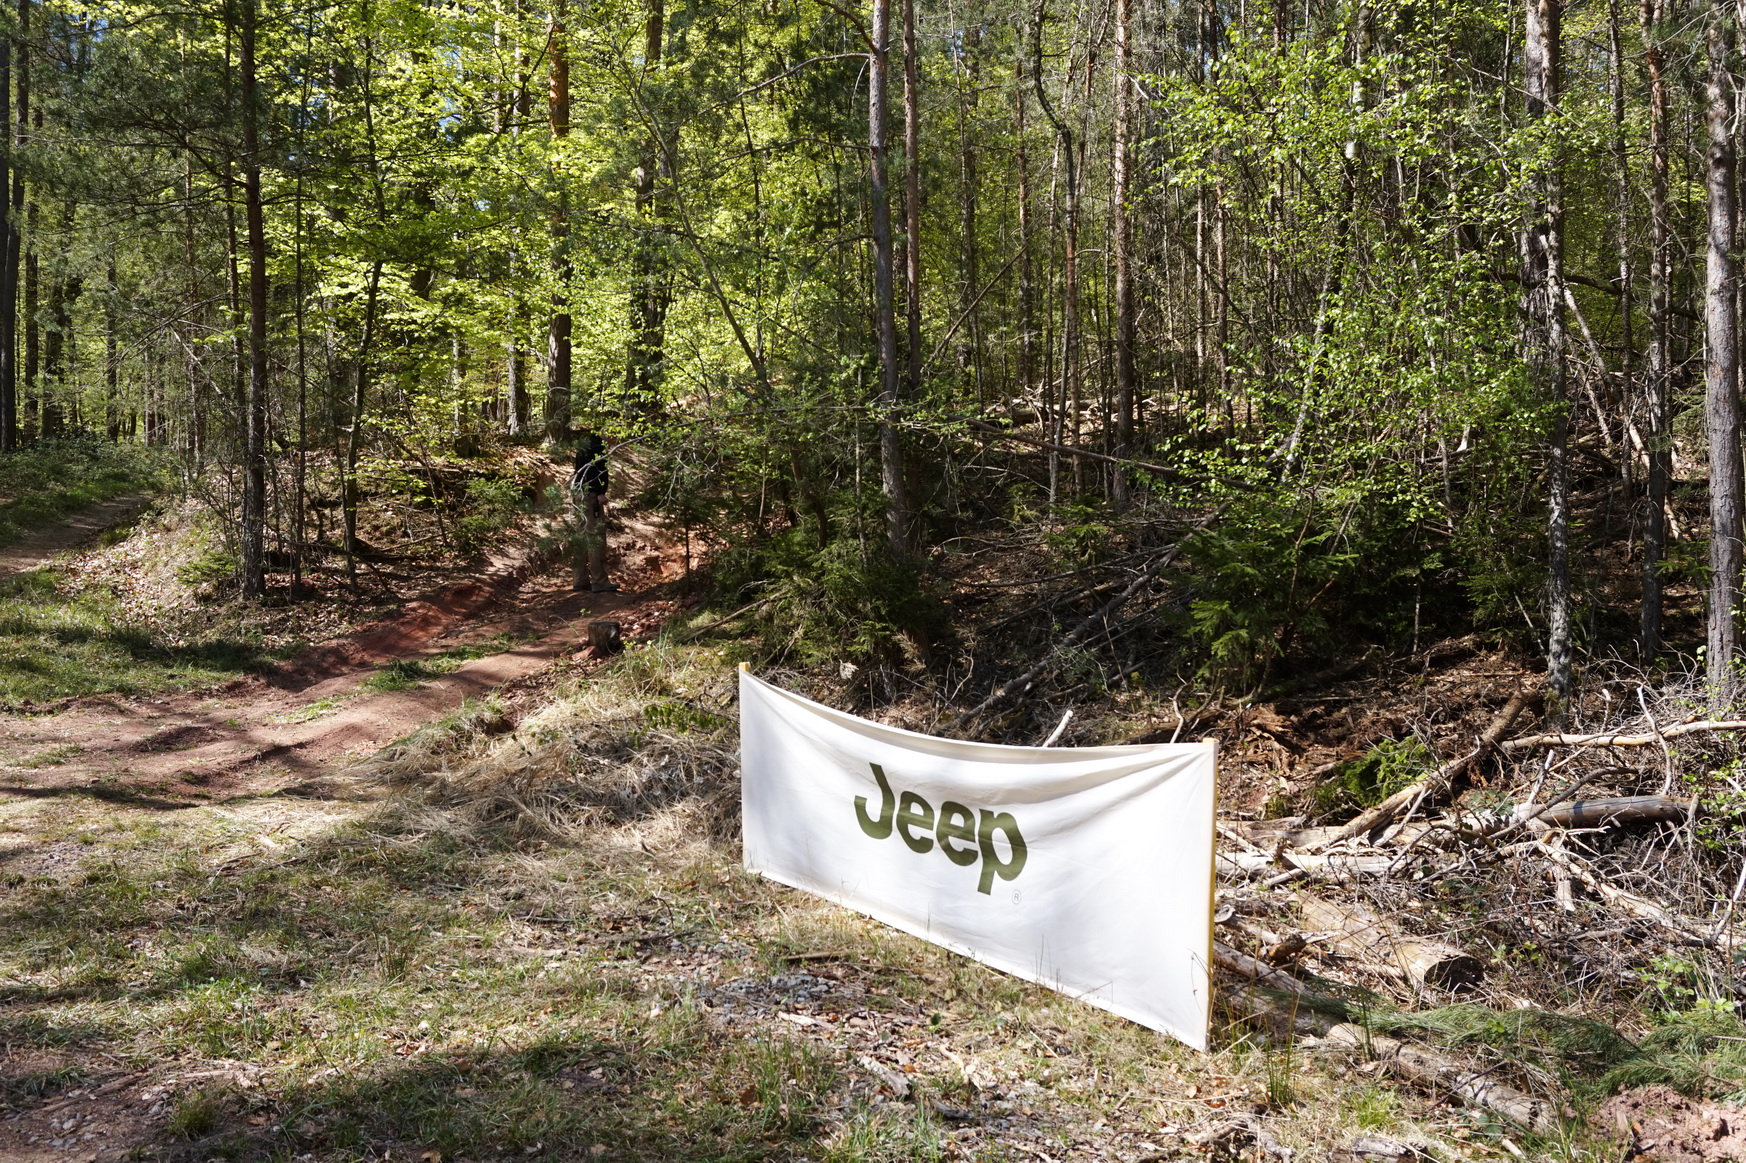 0421 Jeep 14